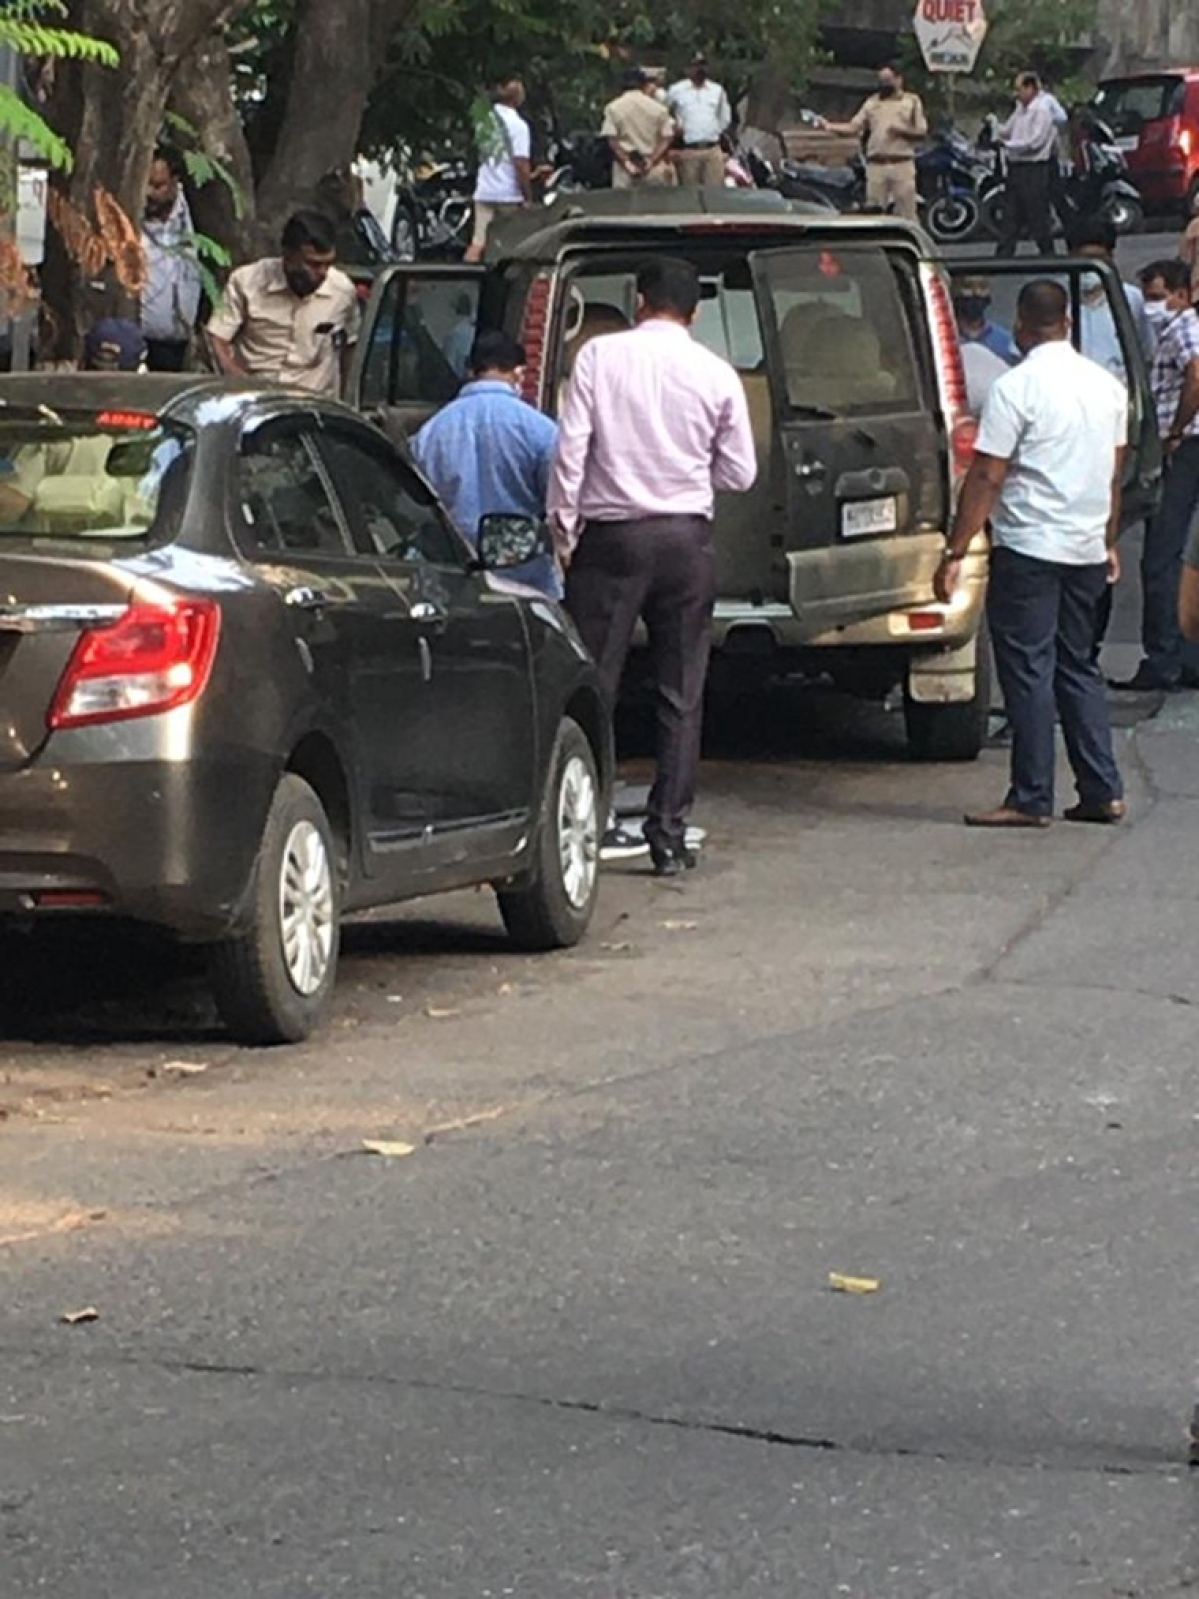 Mumbai: SUV with 20 gelatin sticks found outside Mukesh Ambani's home Antilia; investigation transferred to Crime Branch